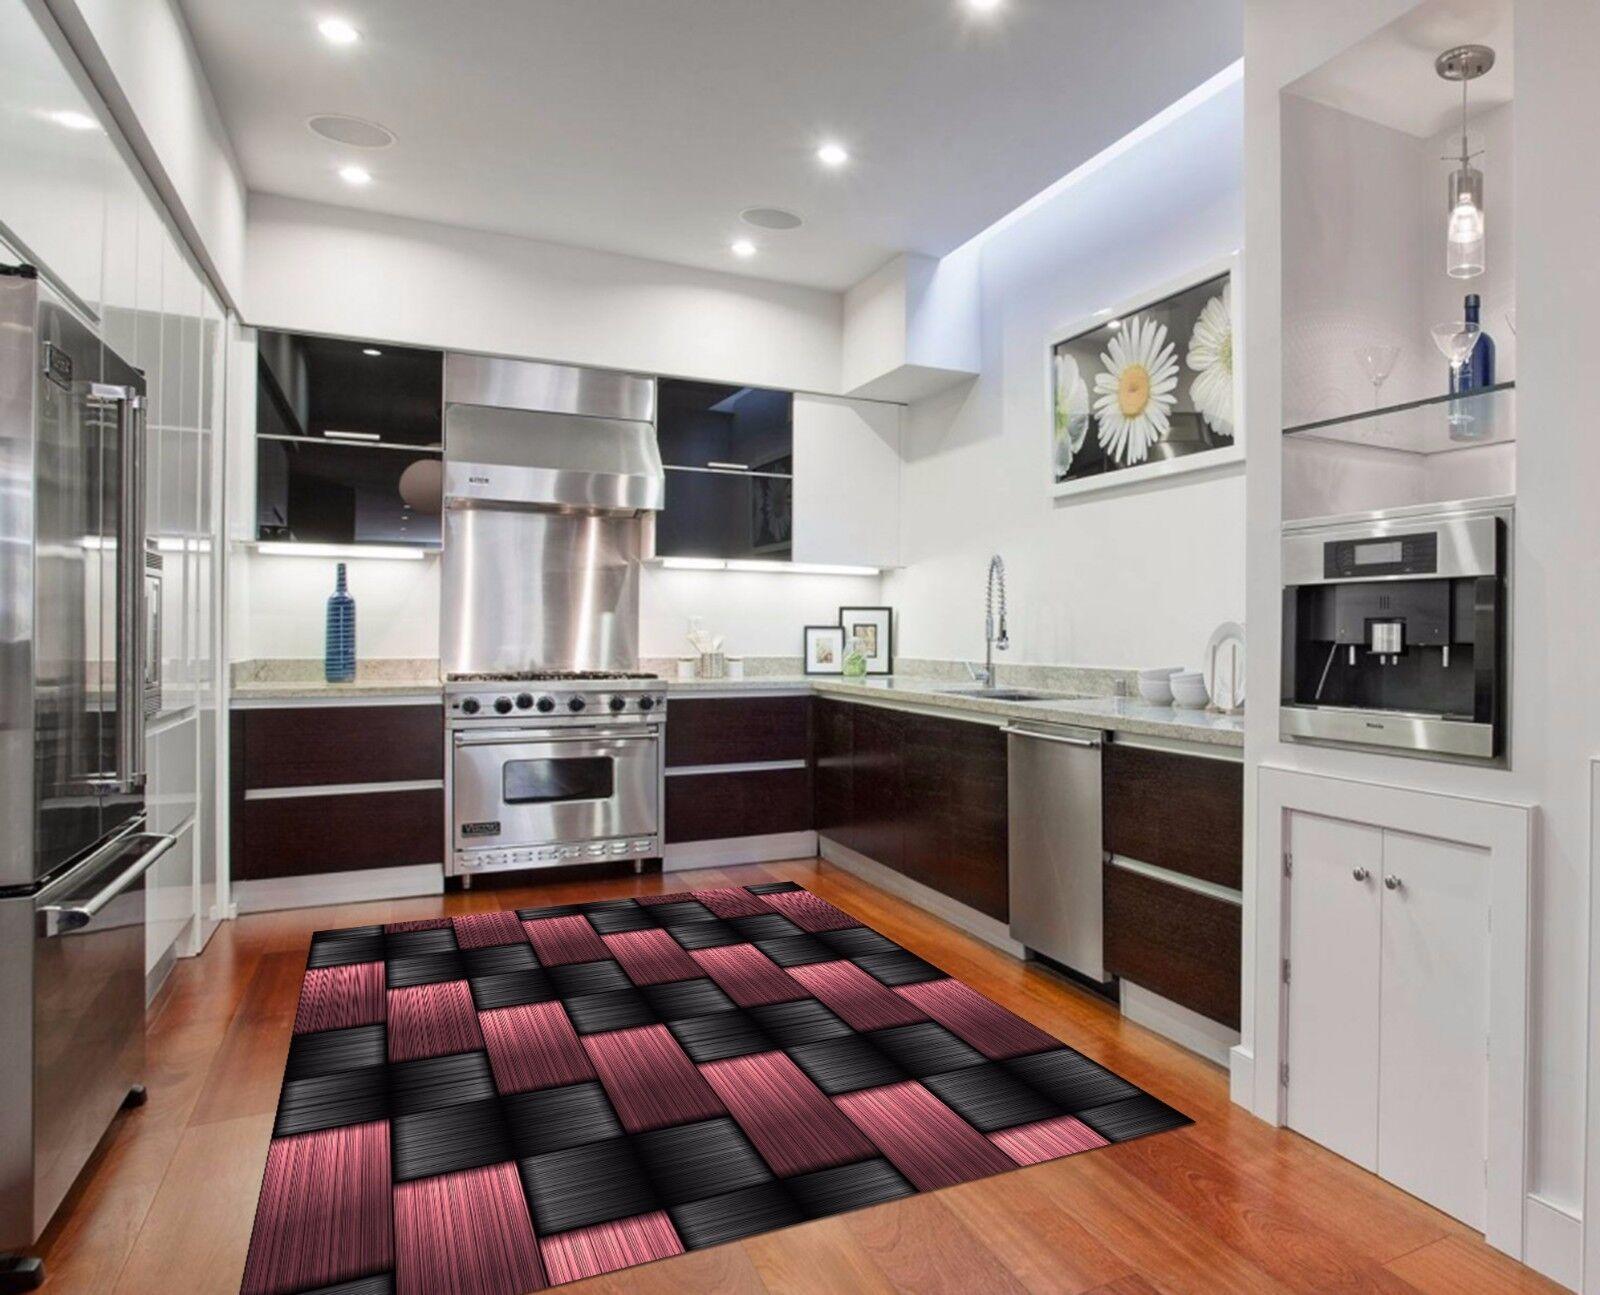 3D Weave Stripes 786 Kitchen Mat Floor Murals Wall Print Wall Deco UK Carly